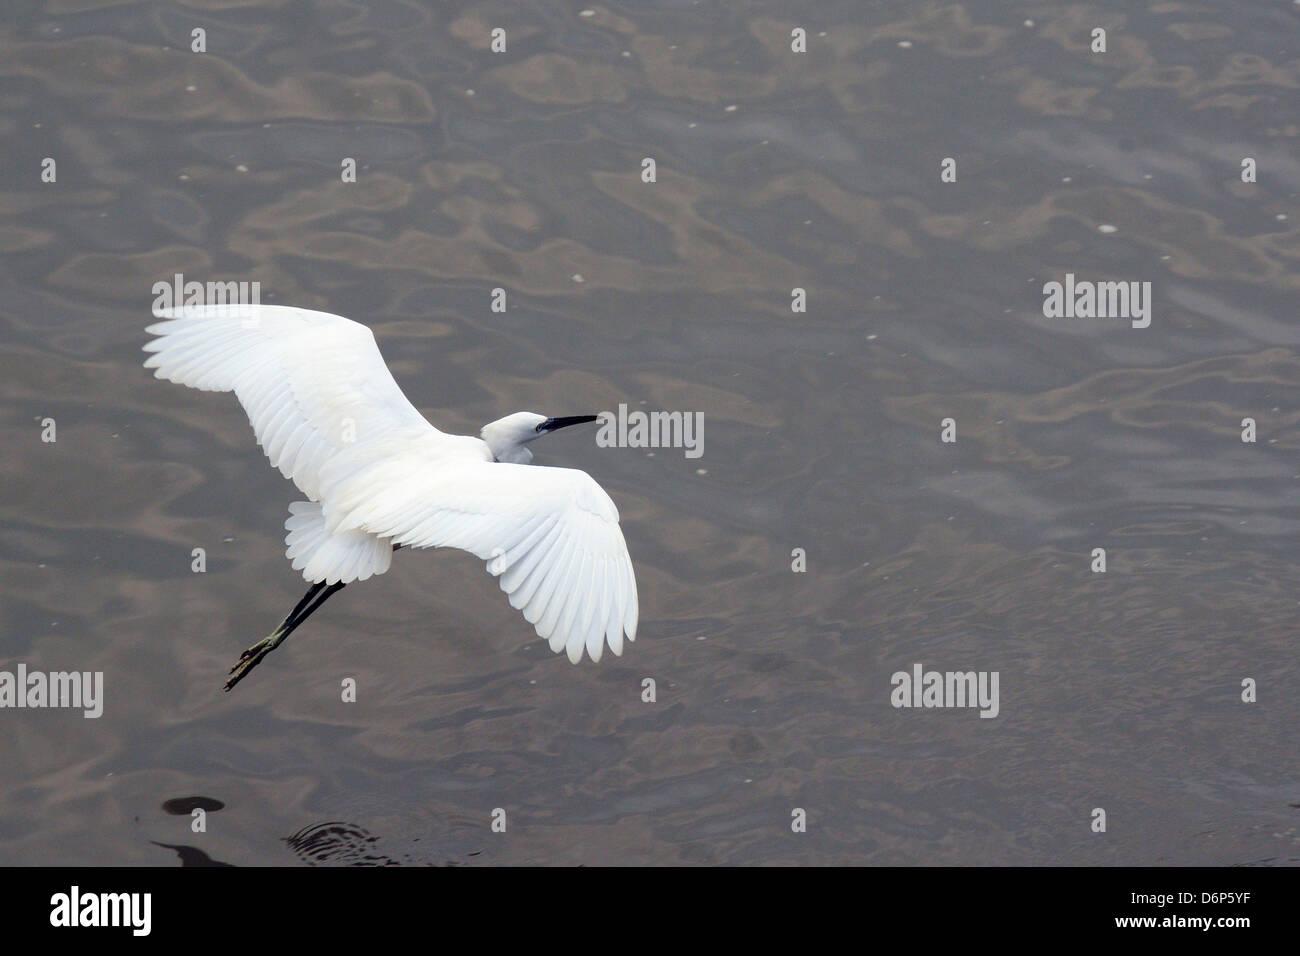 Little egret (Egretta garzetta) flying low over the Tamsui River estuary, Tamsui (Danshui), Taiwan, Asia - Stock Image